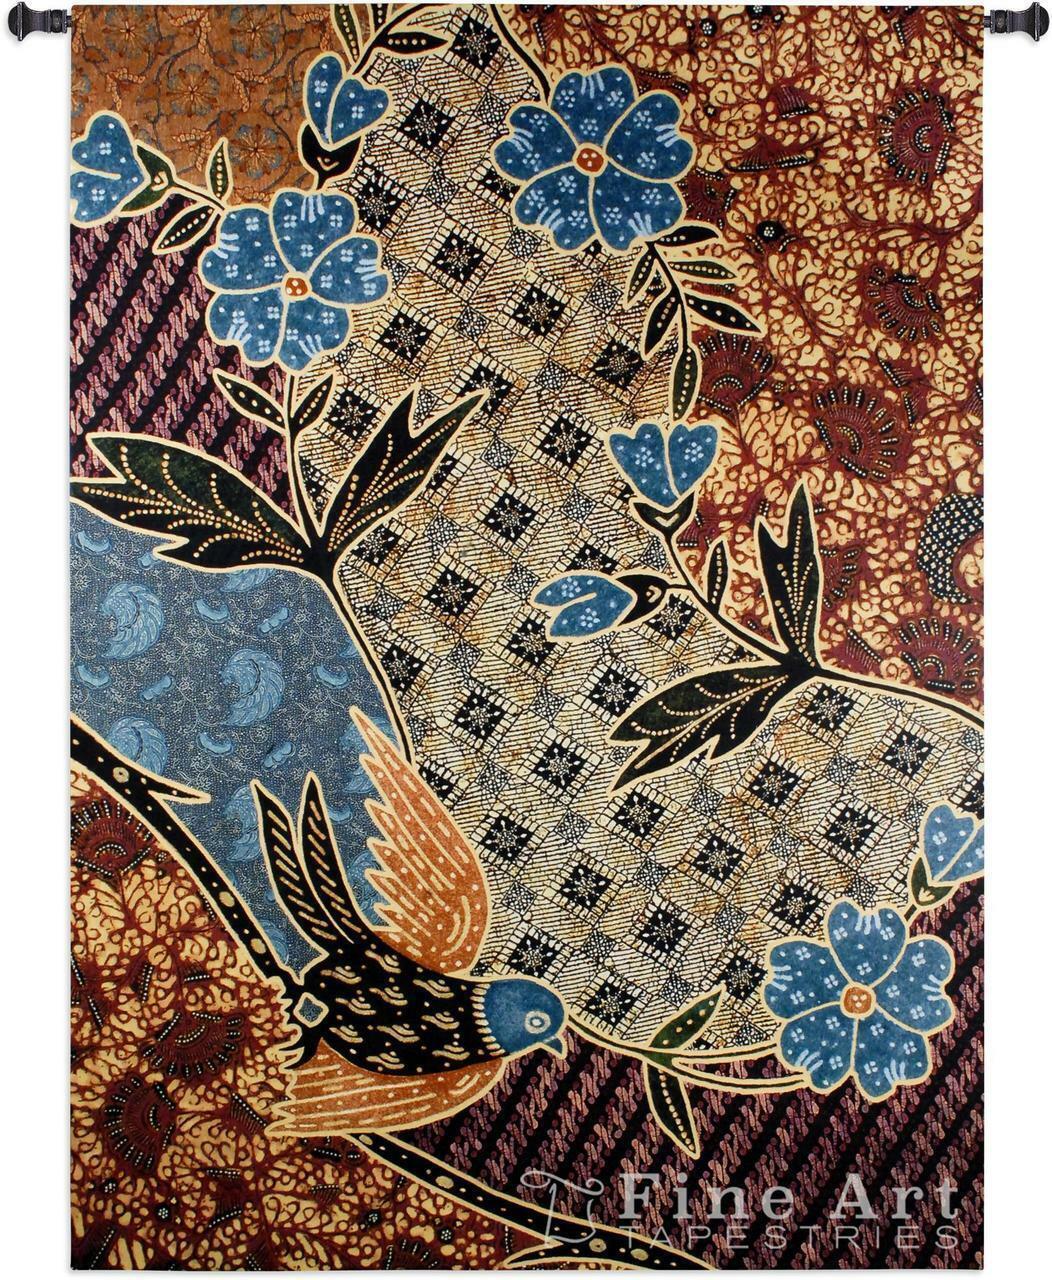 Batik Floral Tapestry Indonesian Wall Hanging Natural Textural Elements 53 x75